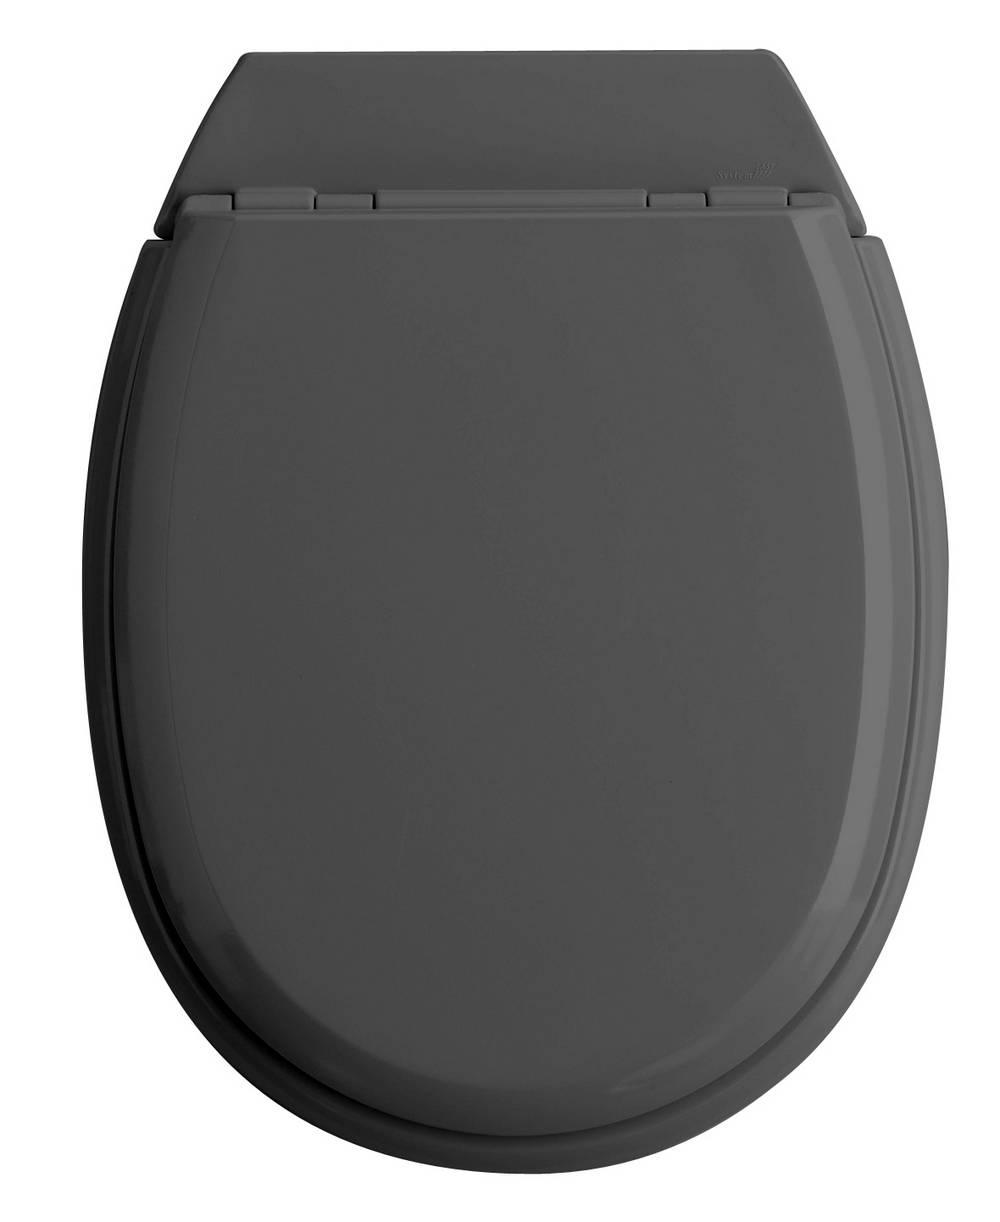 ATLAS - WC-zitting - Glanzend Antraciet Grijs